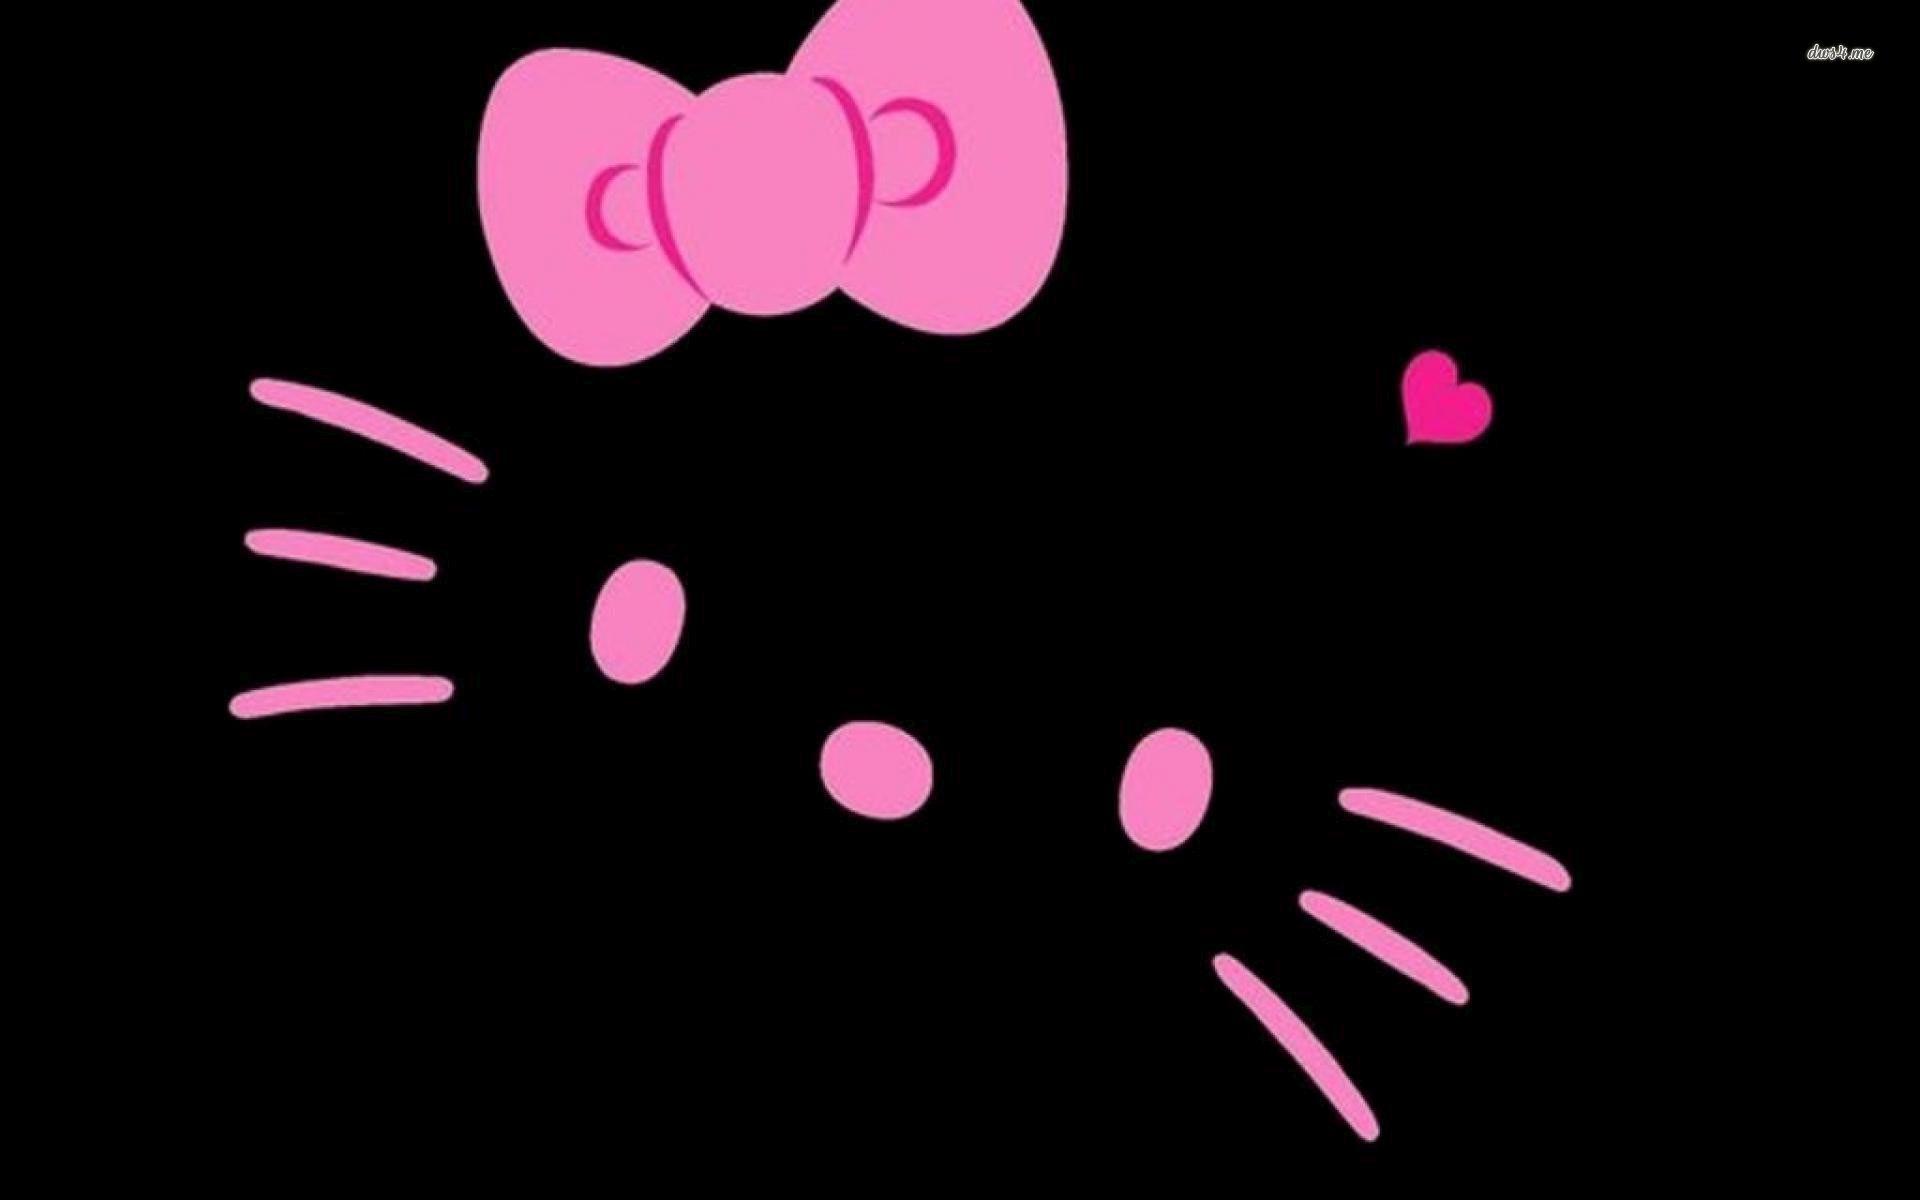 Hello Kitty Wallpaper For Iphone 7 Plus Hello Again Apple Oktober